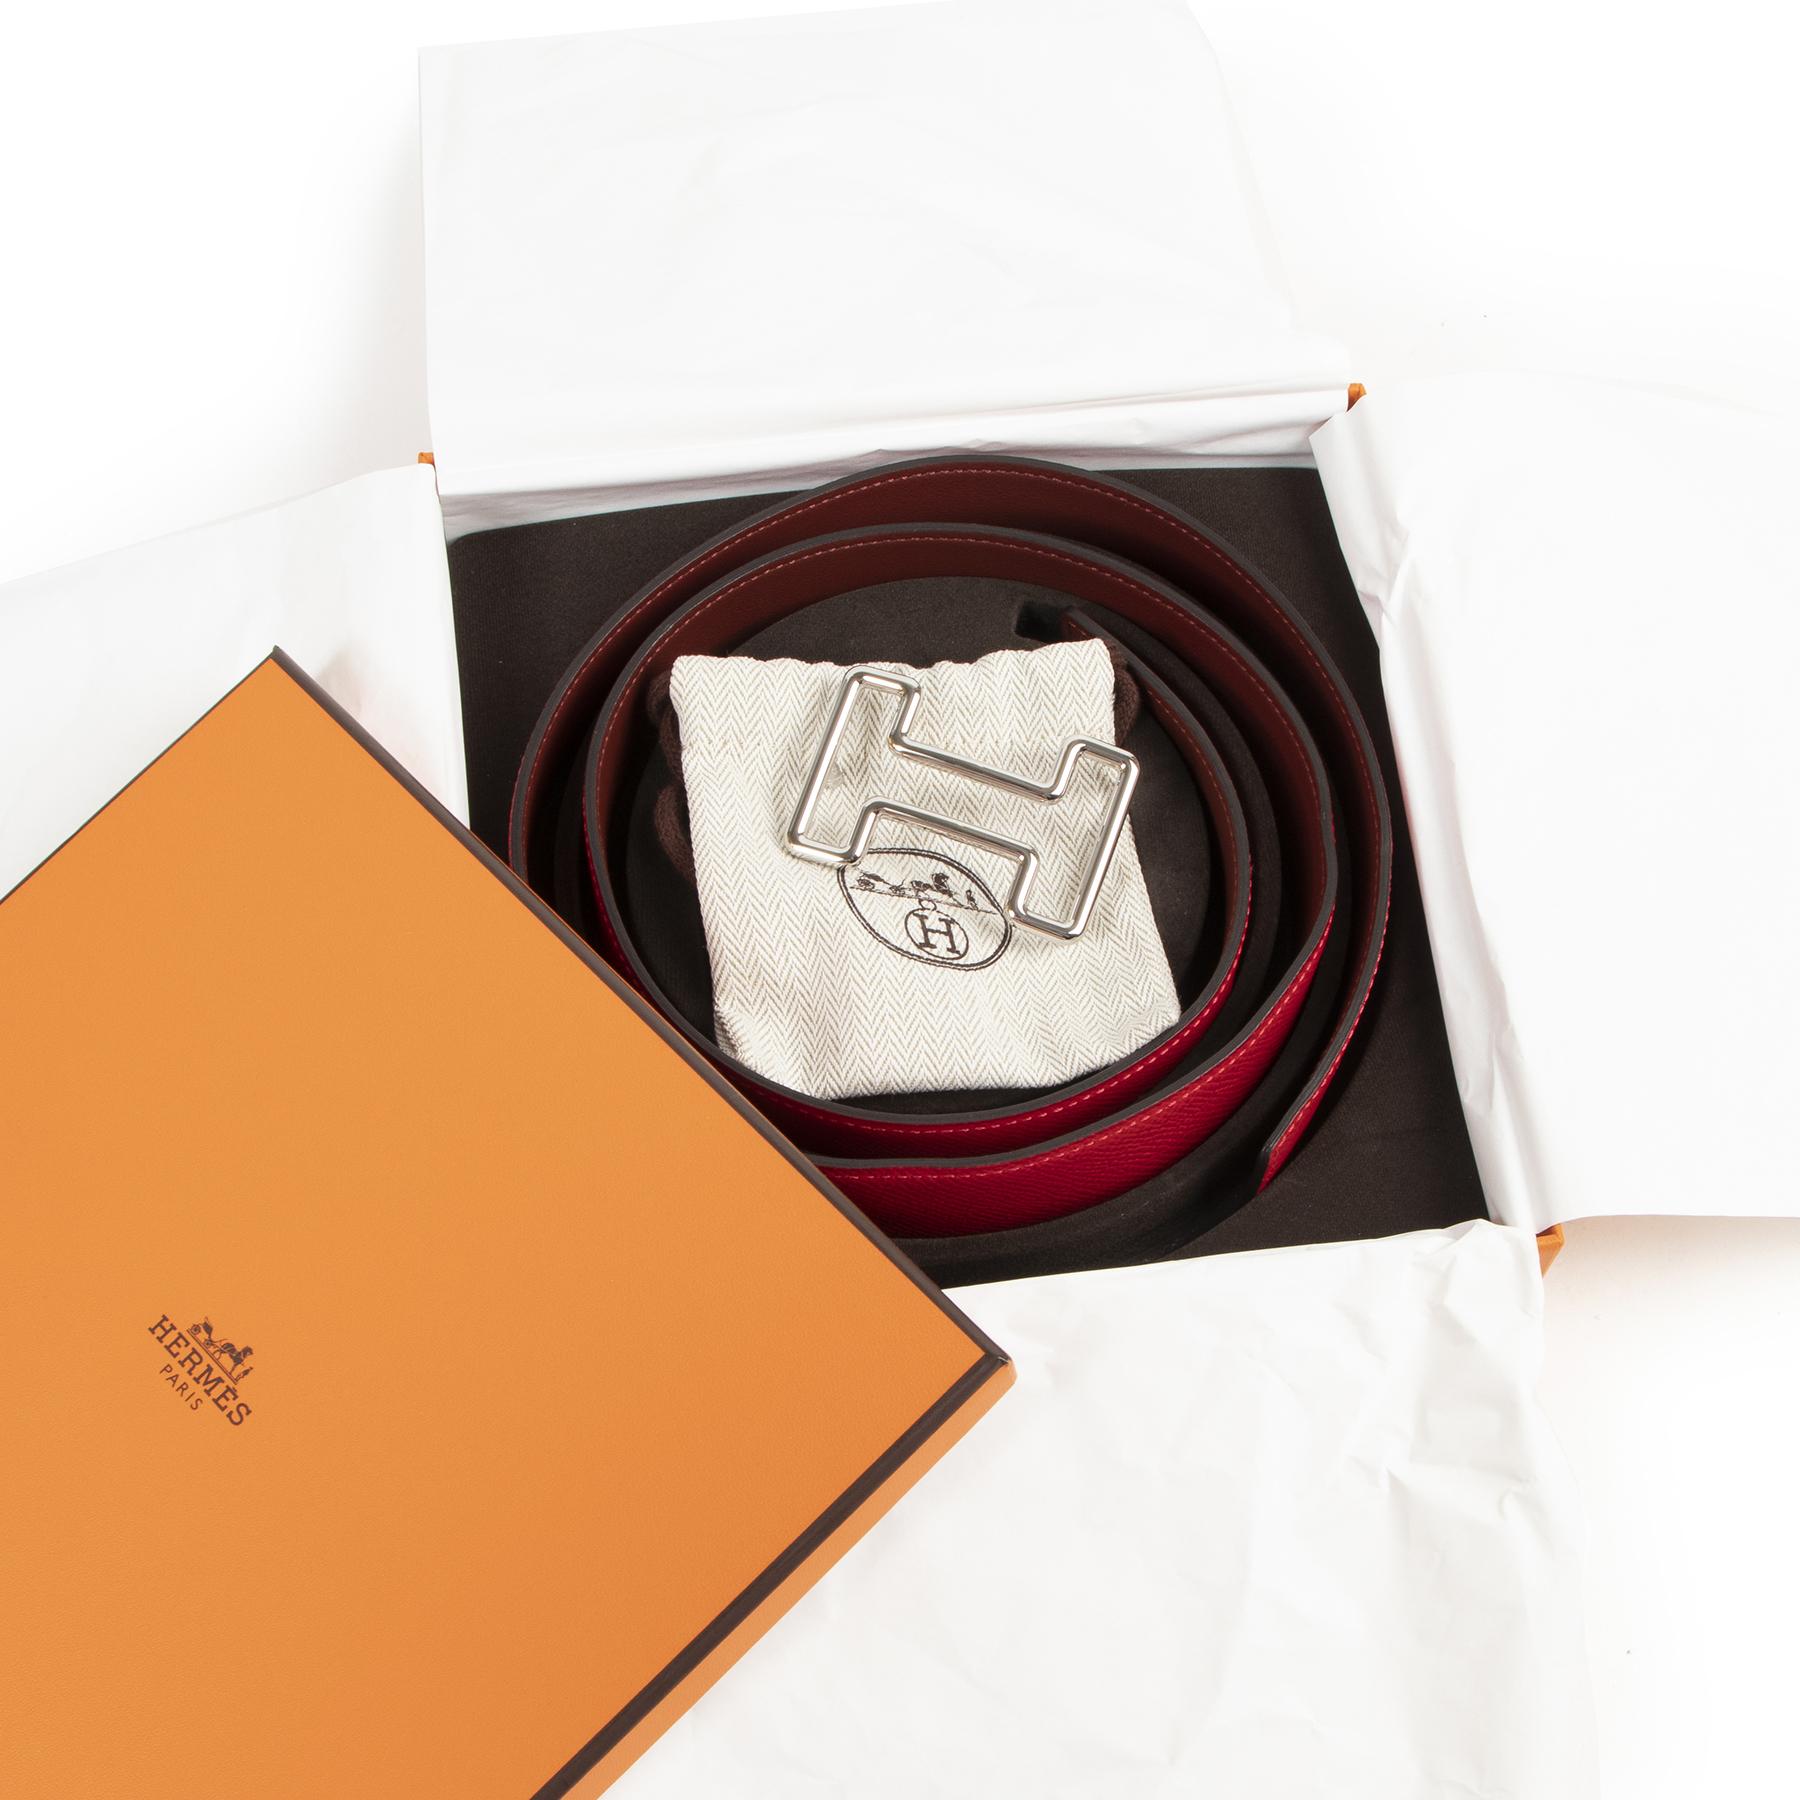 Authentic secondhand Hermès Red Leather Reversible H Belt - Size 105 designer accessories fashion luxury vintage webshop safe secure online shopping